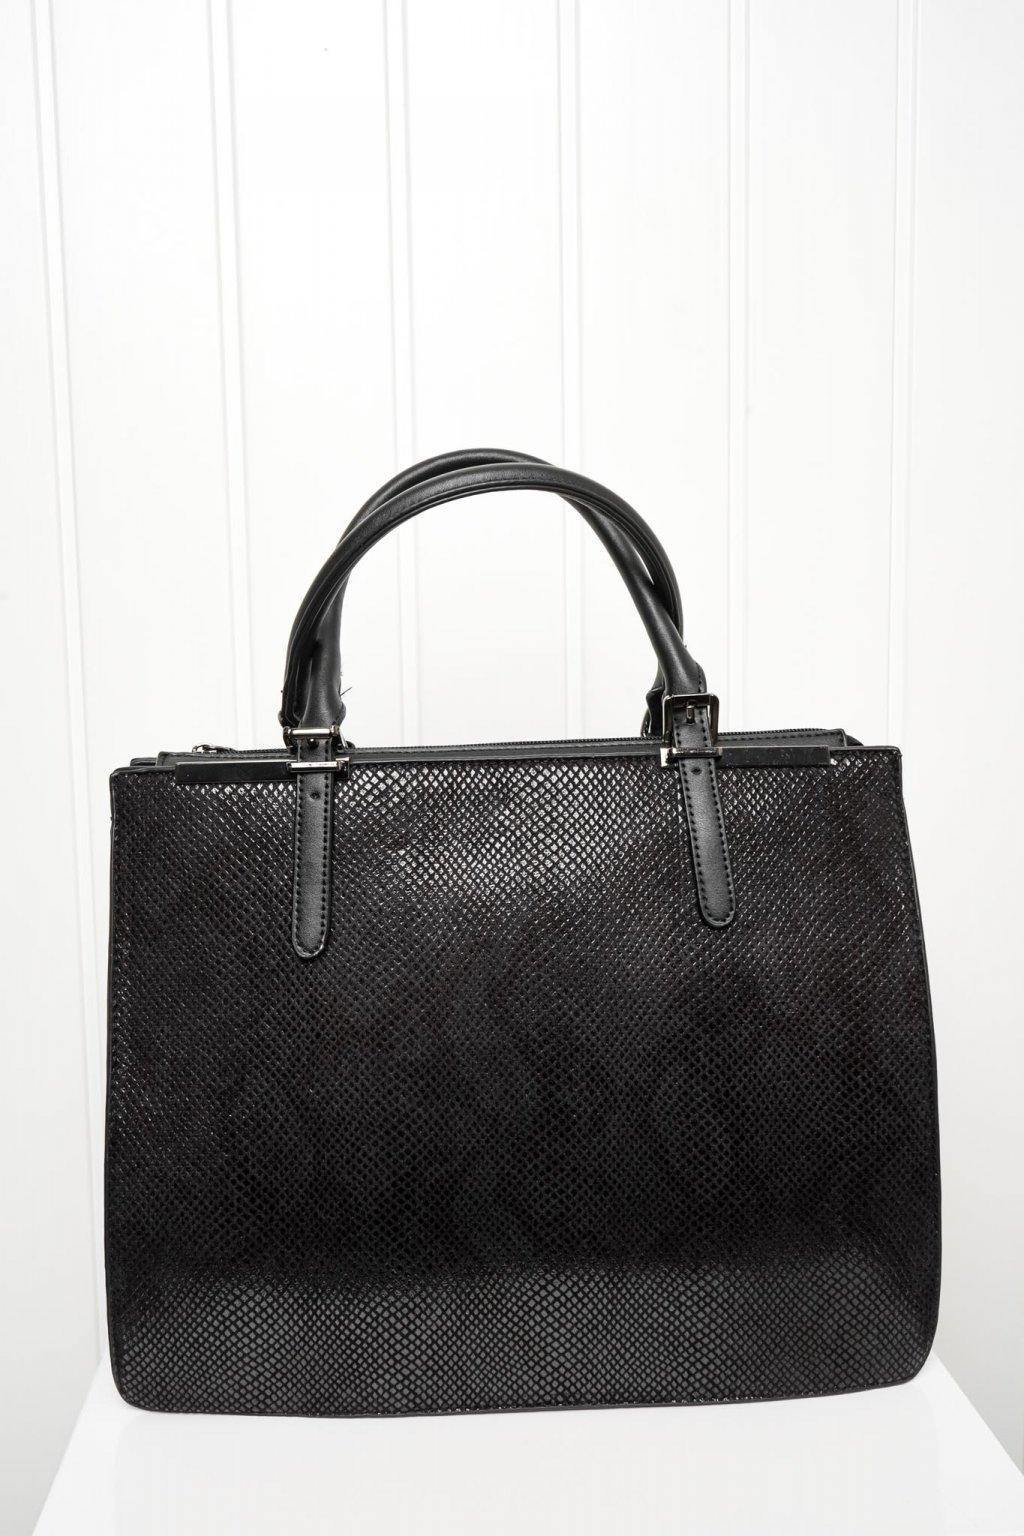 Kabelka, crossbody, ruksak, shopping bag, shopperka, 007